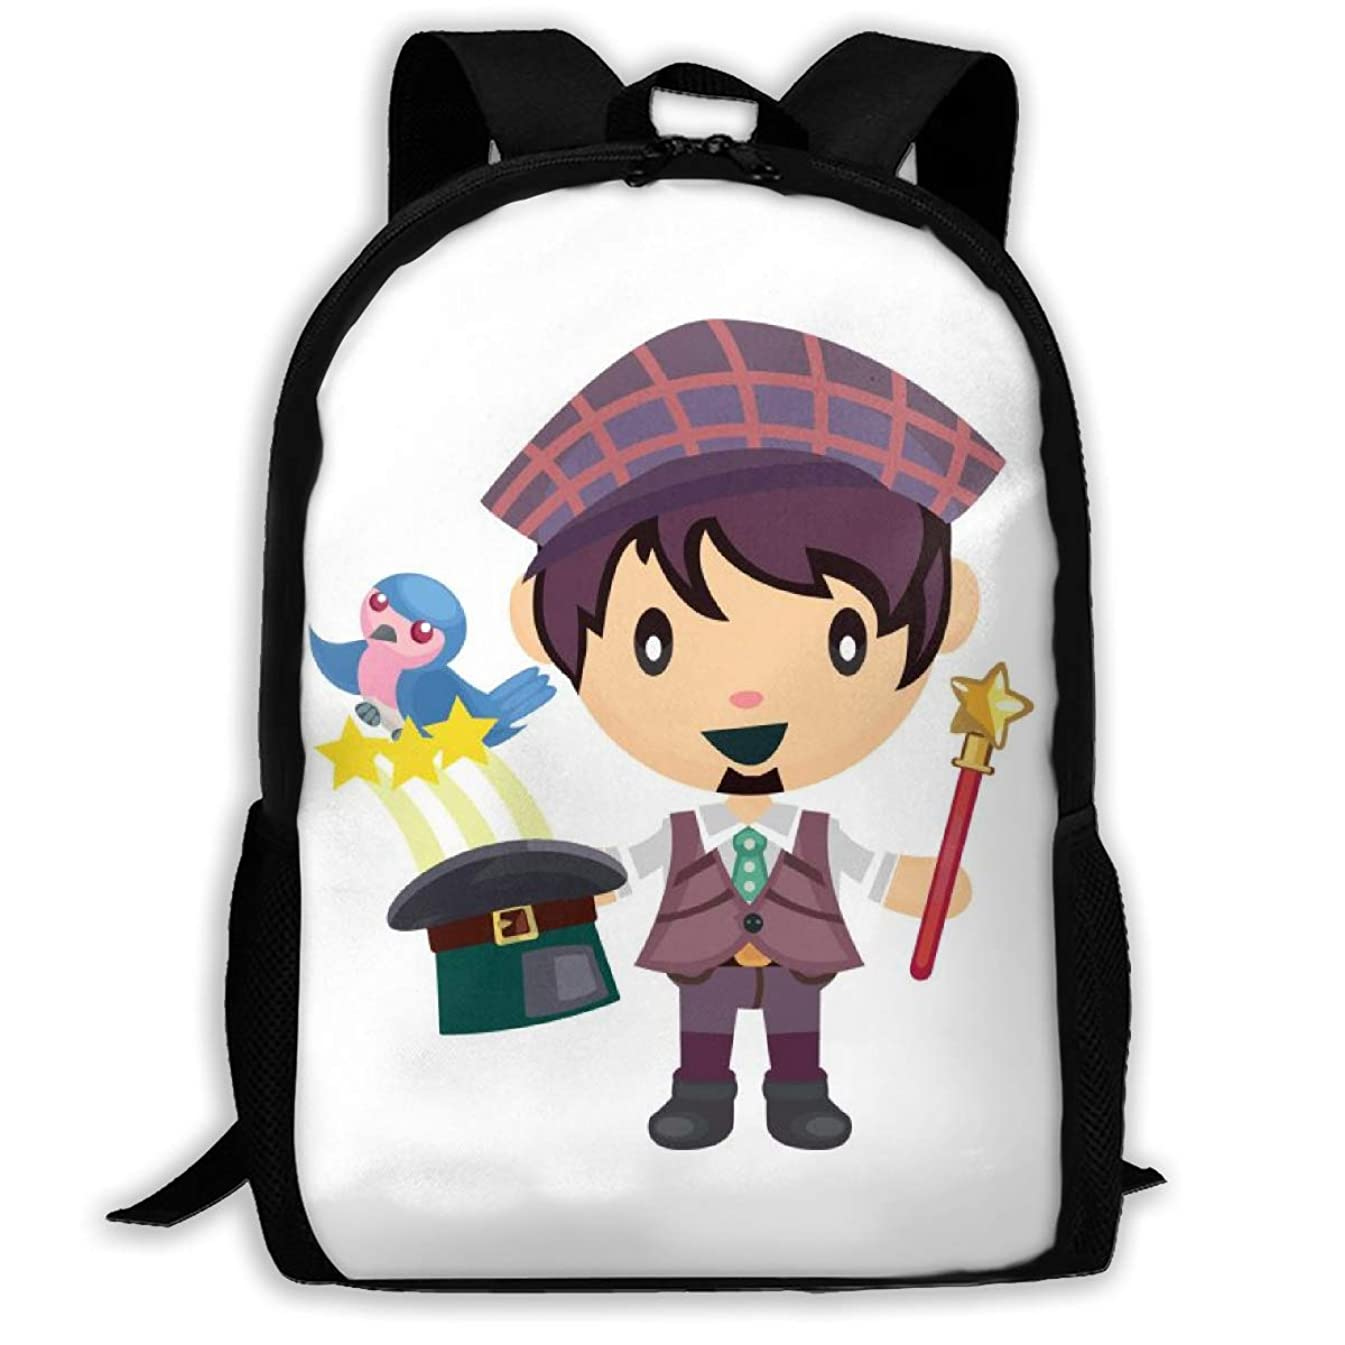 Laptop Backpack Young Man As A Magician Zipper College Bookbag Daypack Travel Rucksack Gym Bag For Man Women